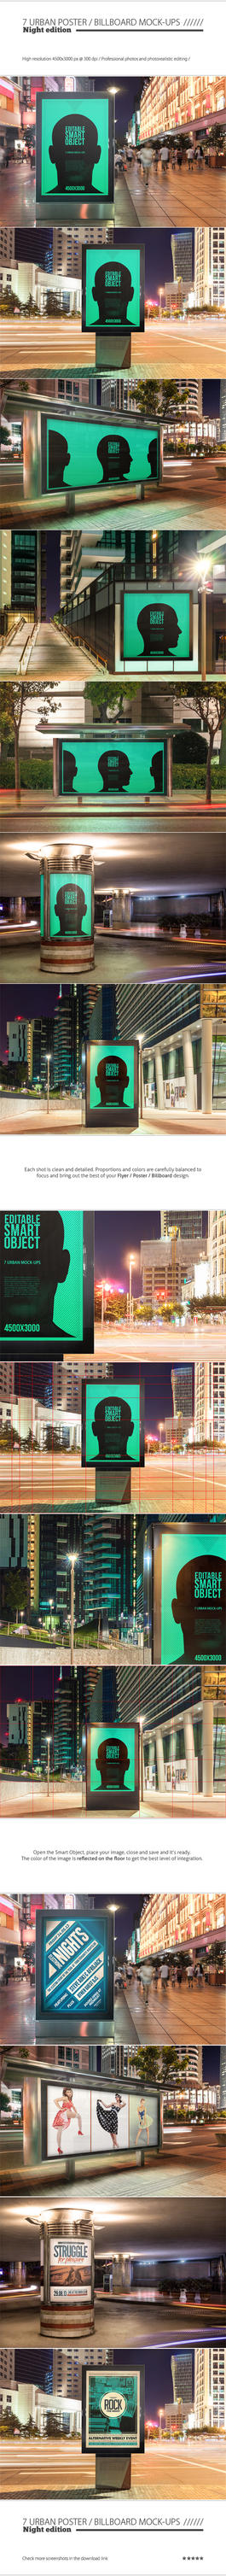 Urban Poster / Billboard Mock-ups - Night Edition by NuwanP